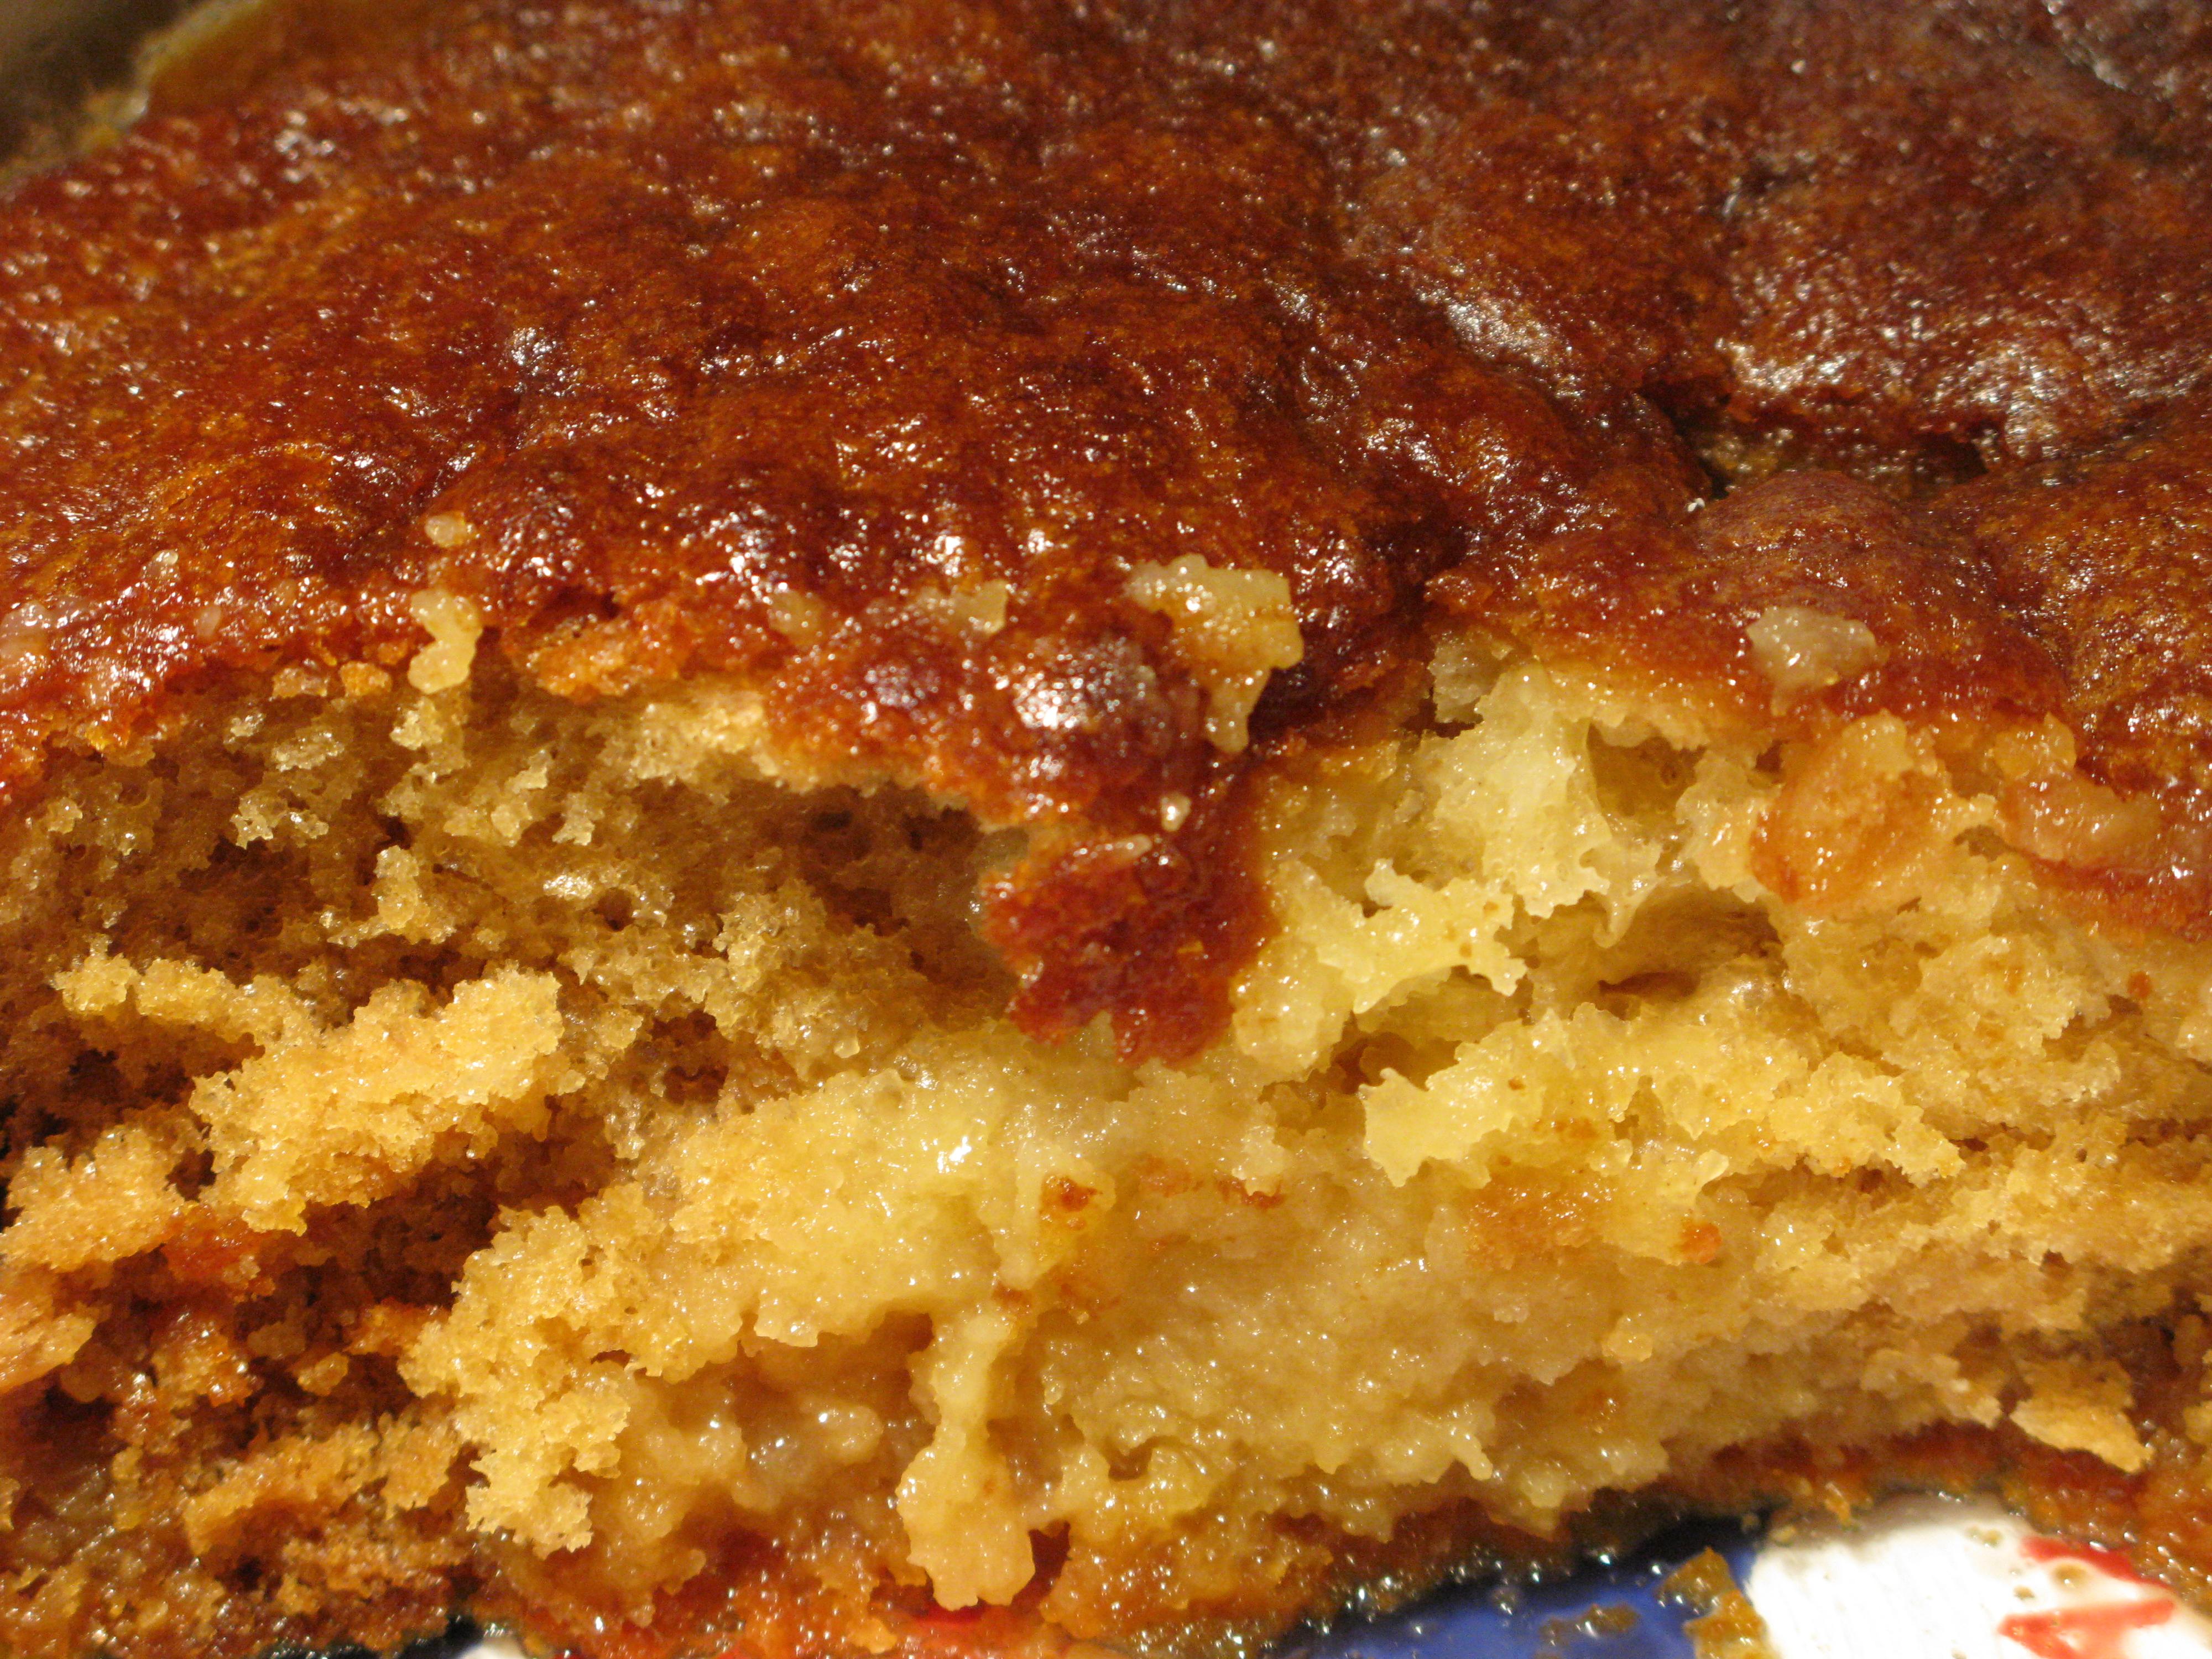 Butterscotch Cake Recipes In Microwave